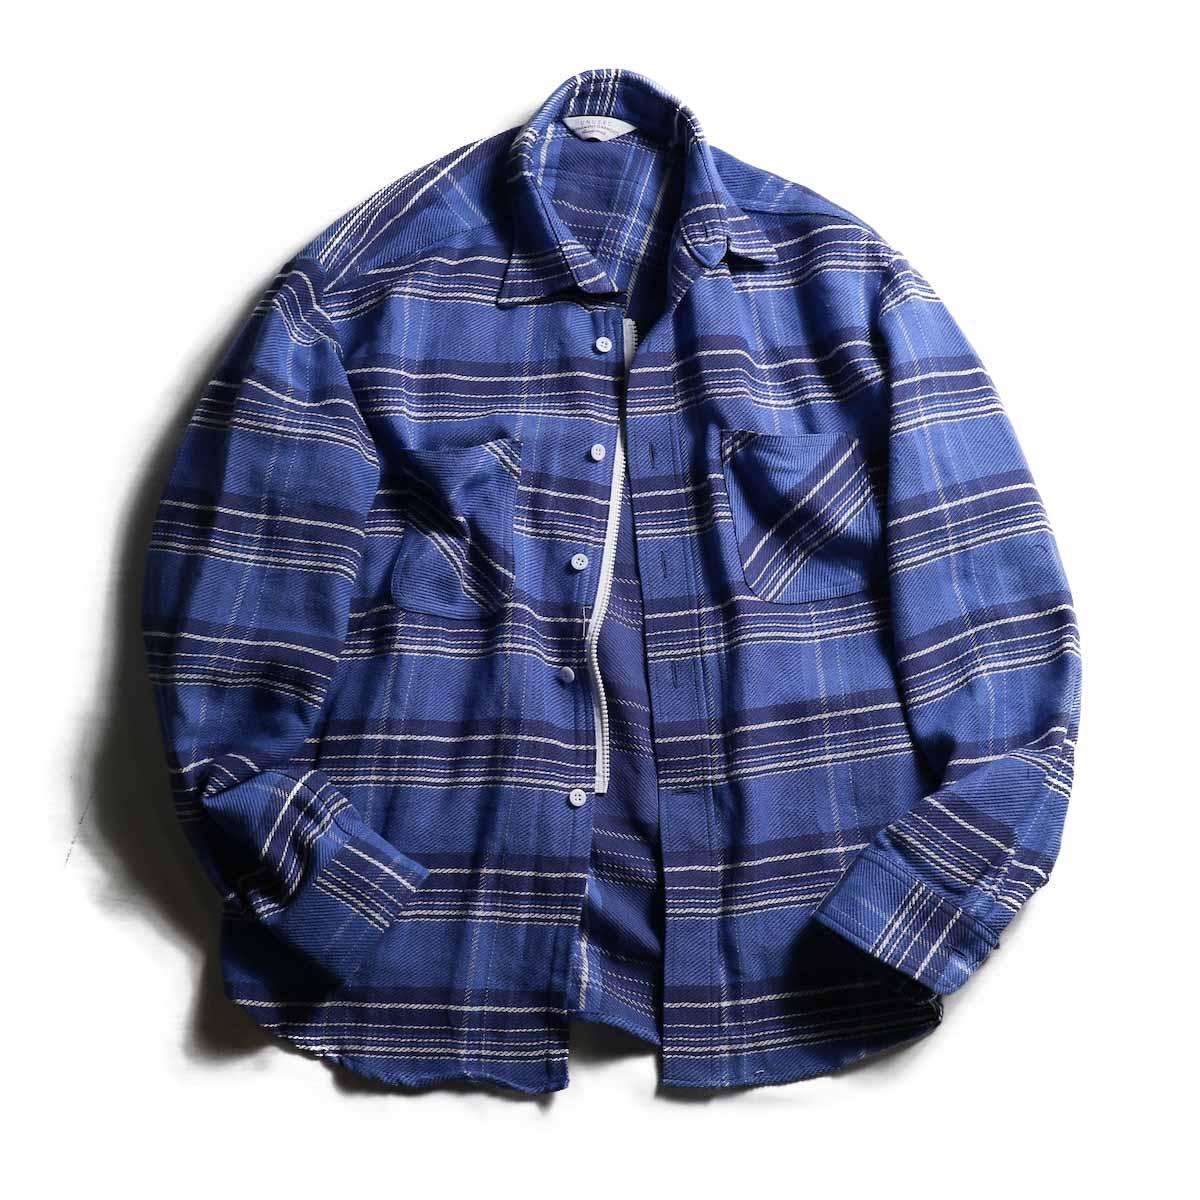 UNUSED / US1482 Check Nel Shirt